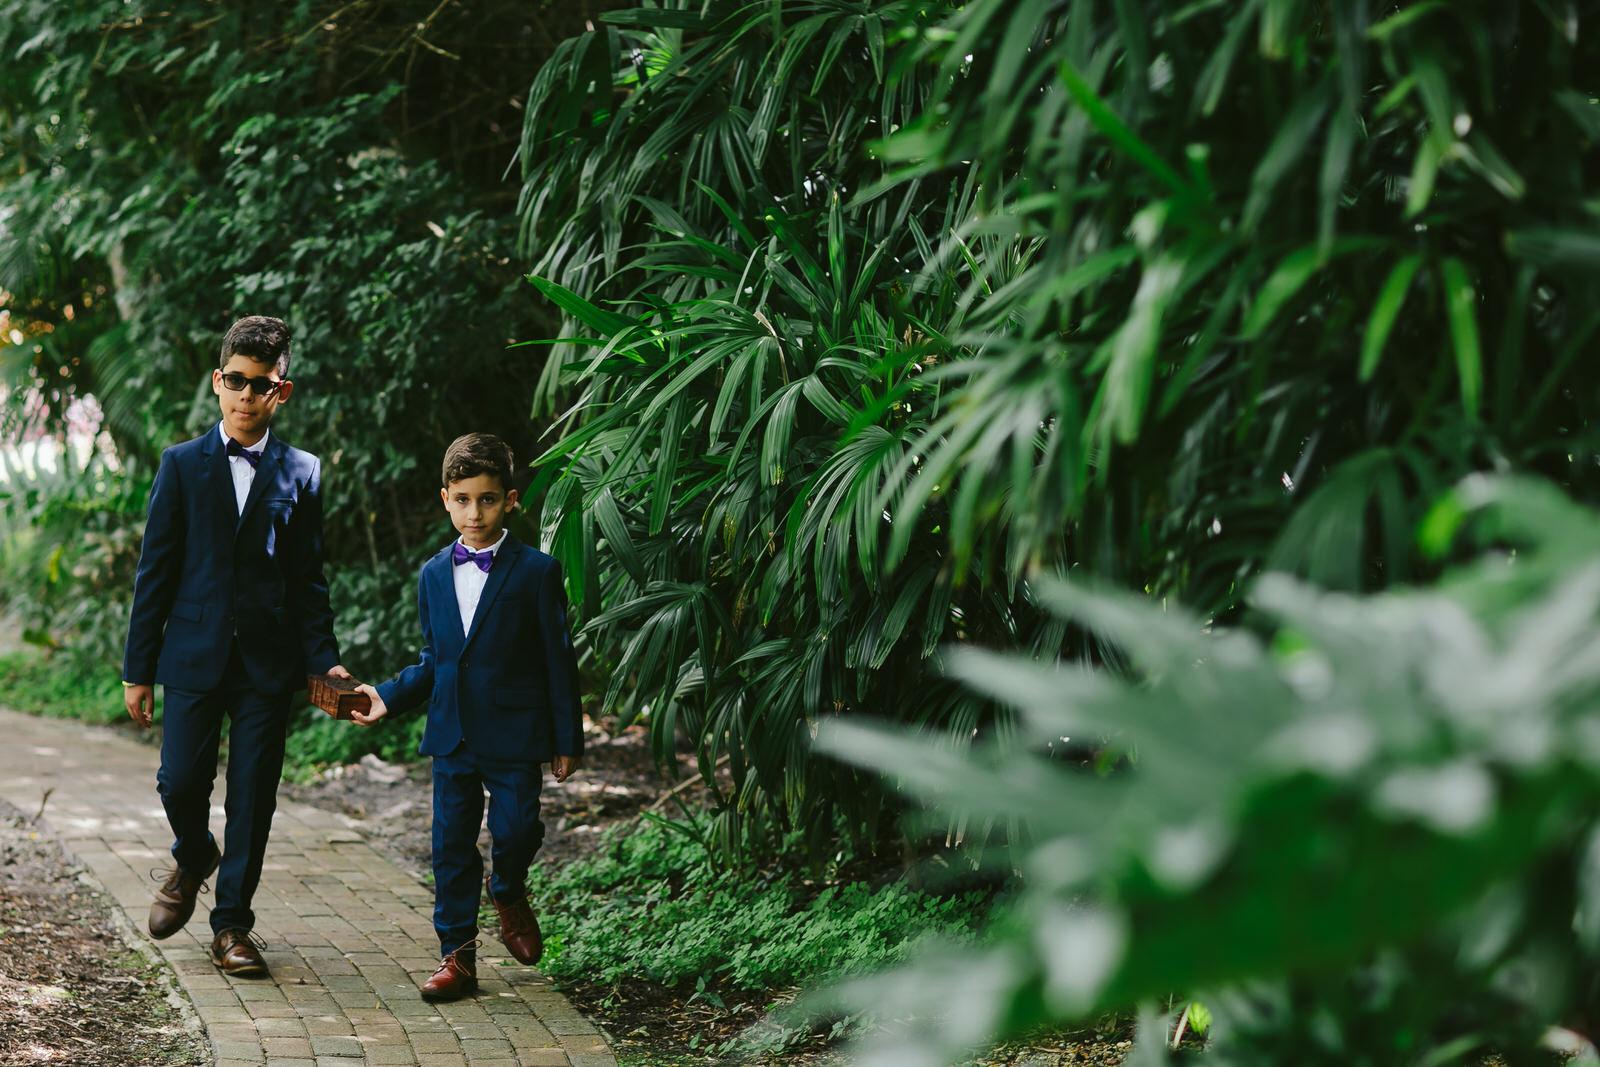 kashi-ashram-wedding-sebastian-florida-tiny-house-photo-386.jpg